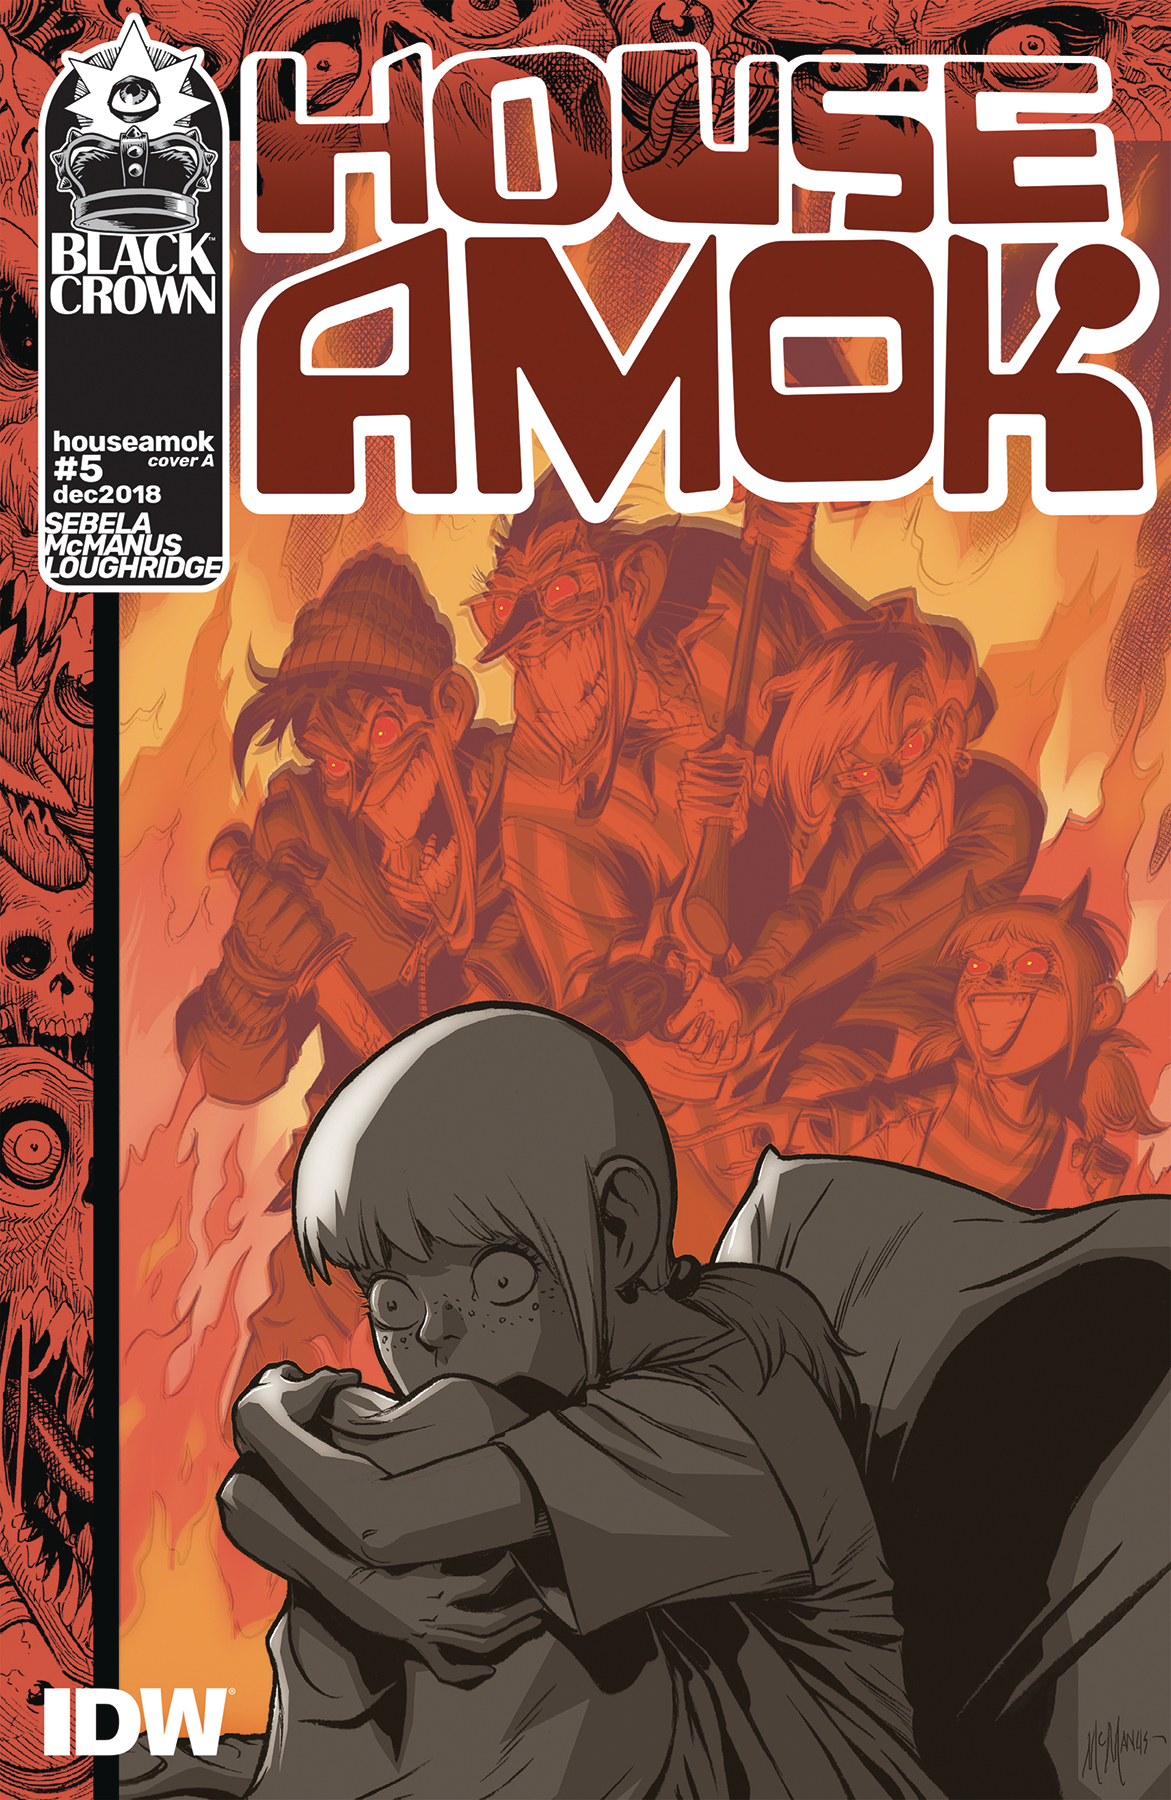 House Amok #5.jpg